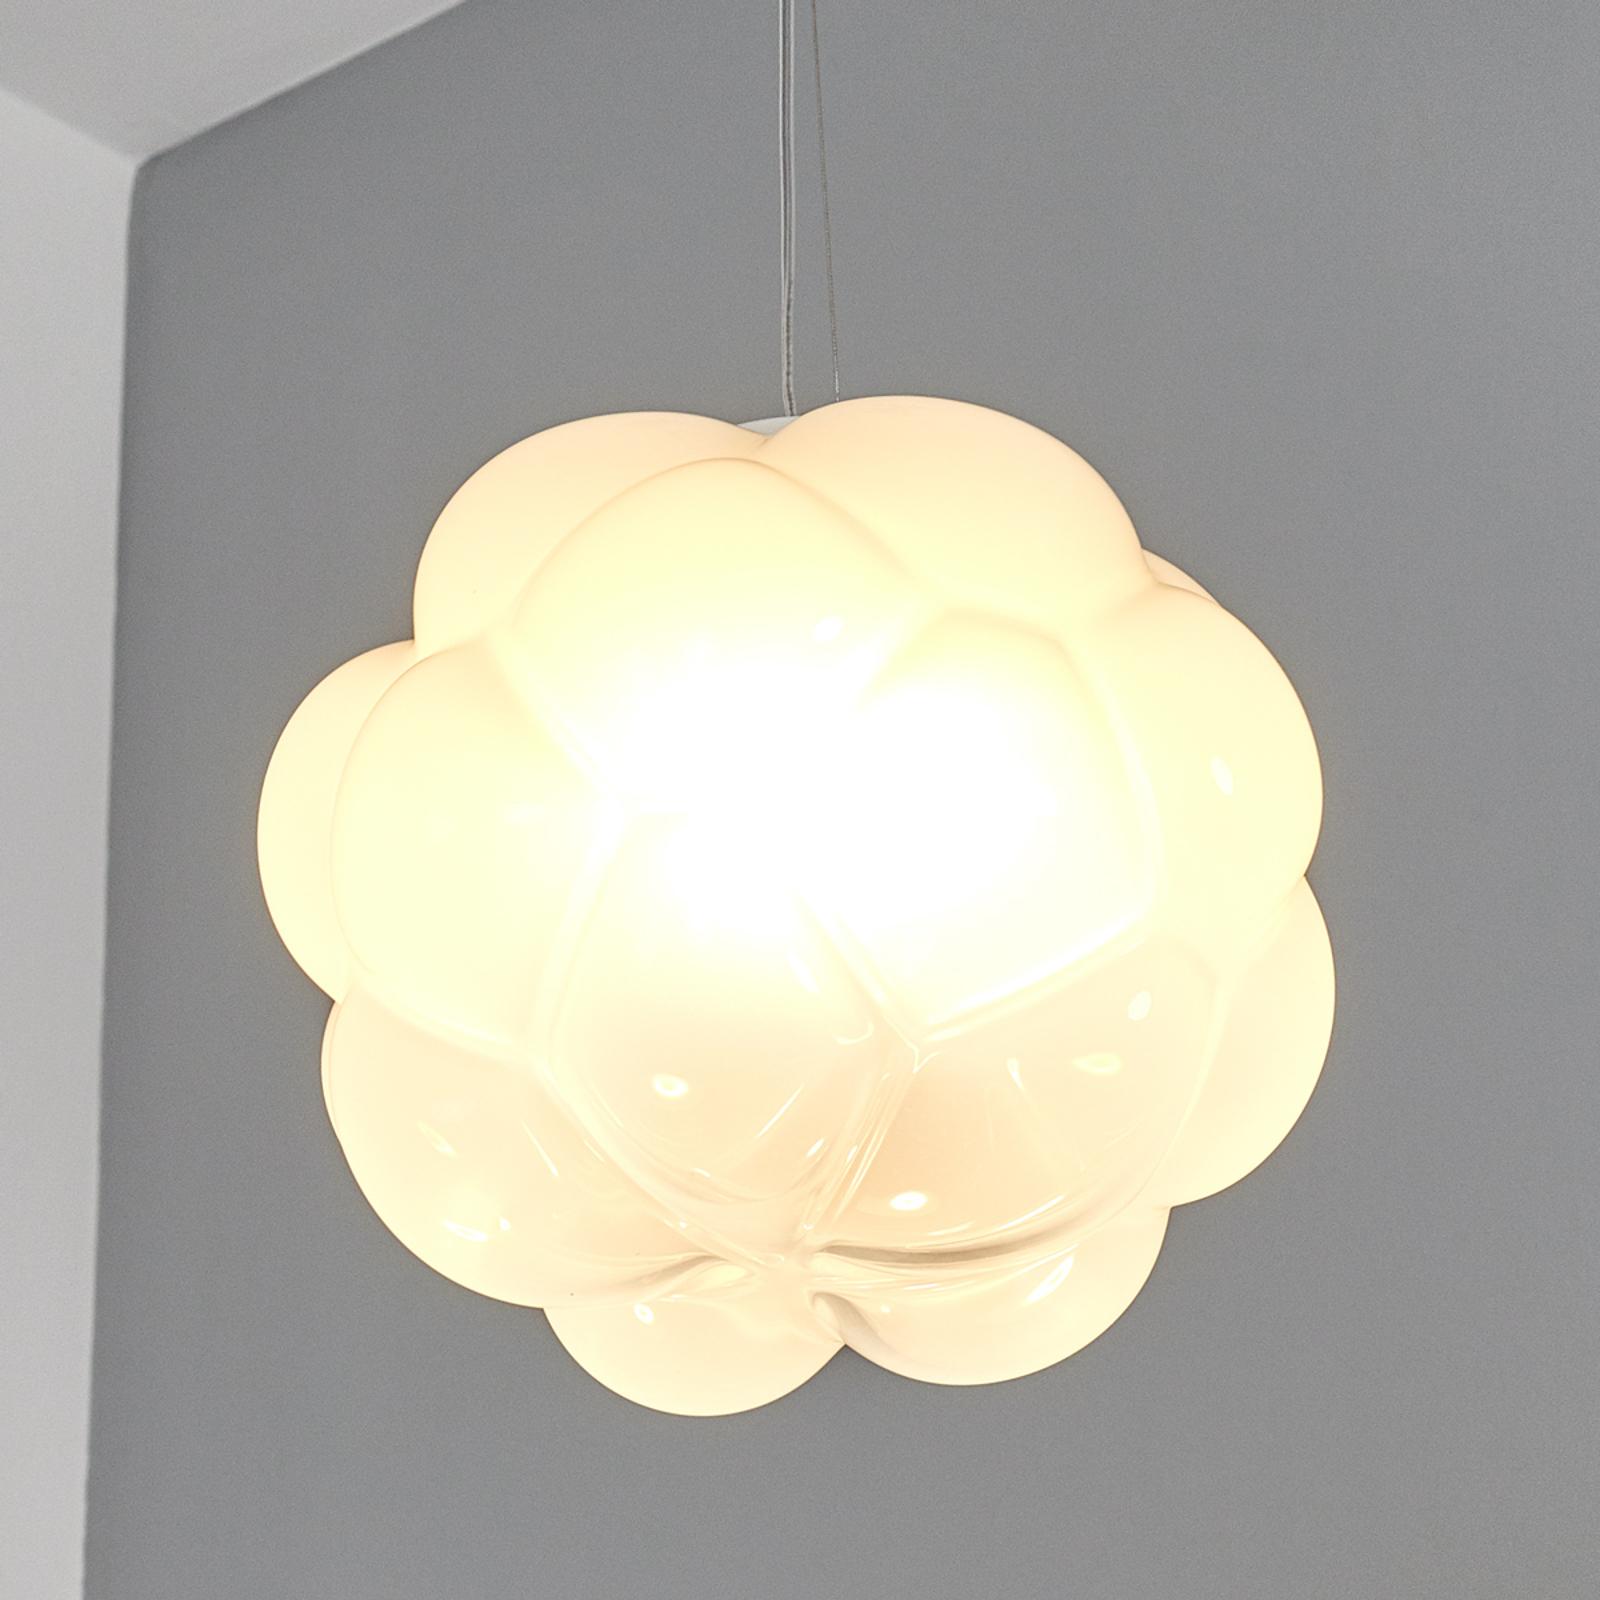 Skyformet LED-hengelampe Cloudy, 26 cm